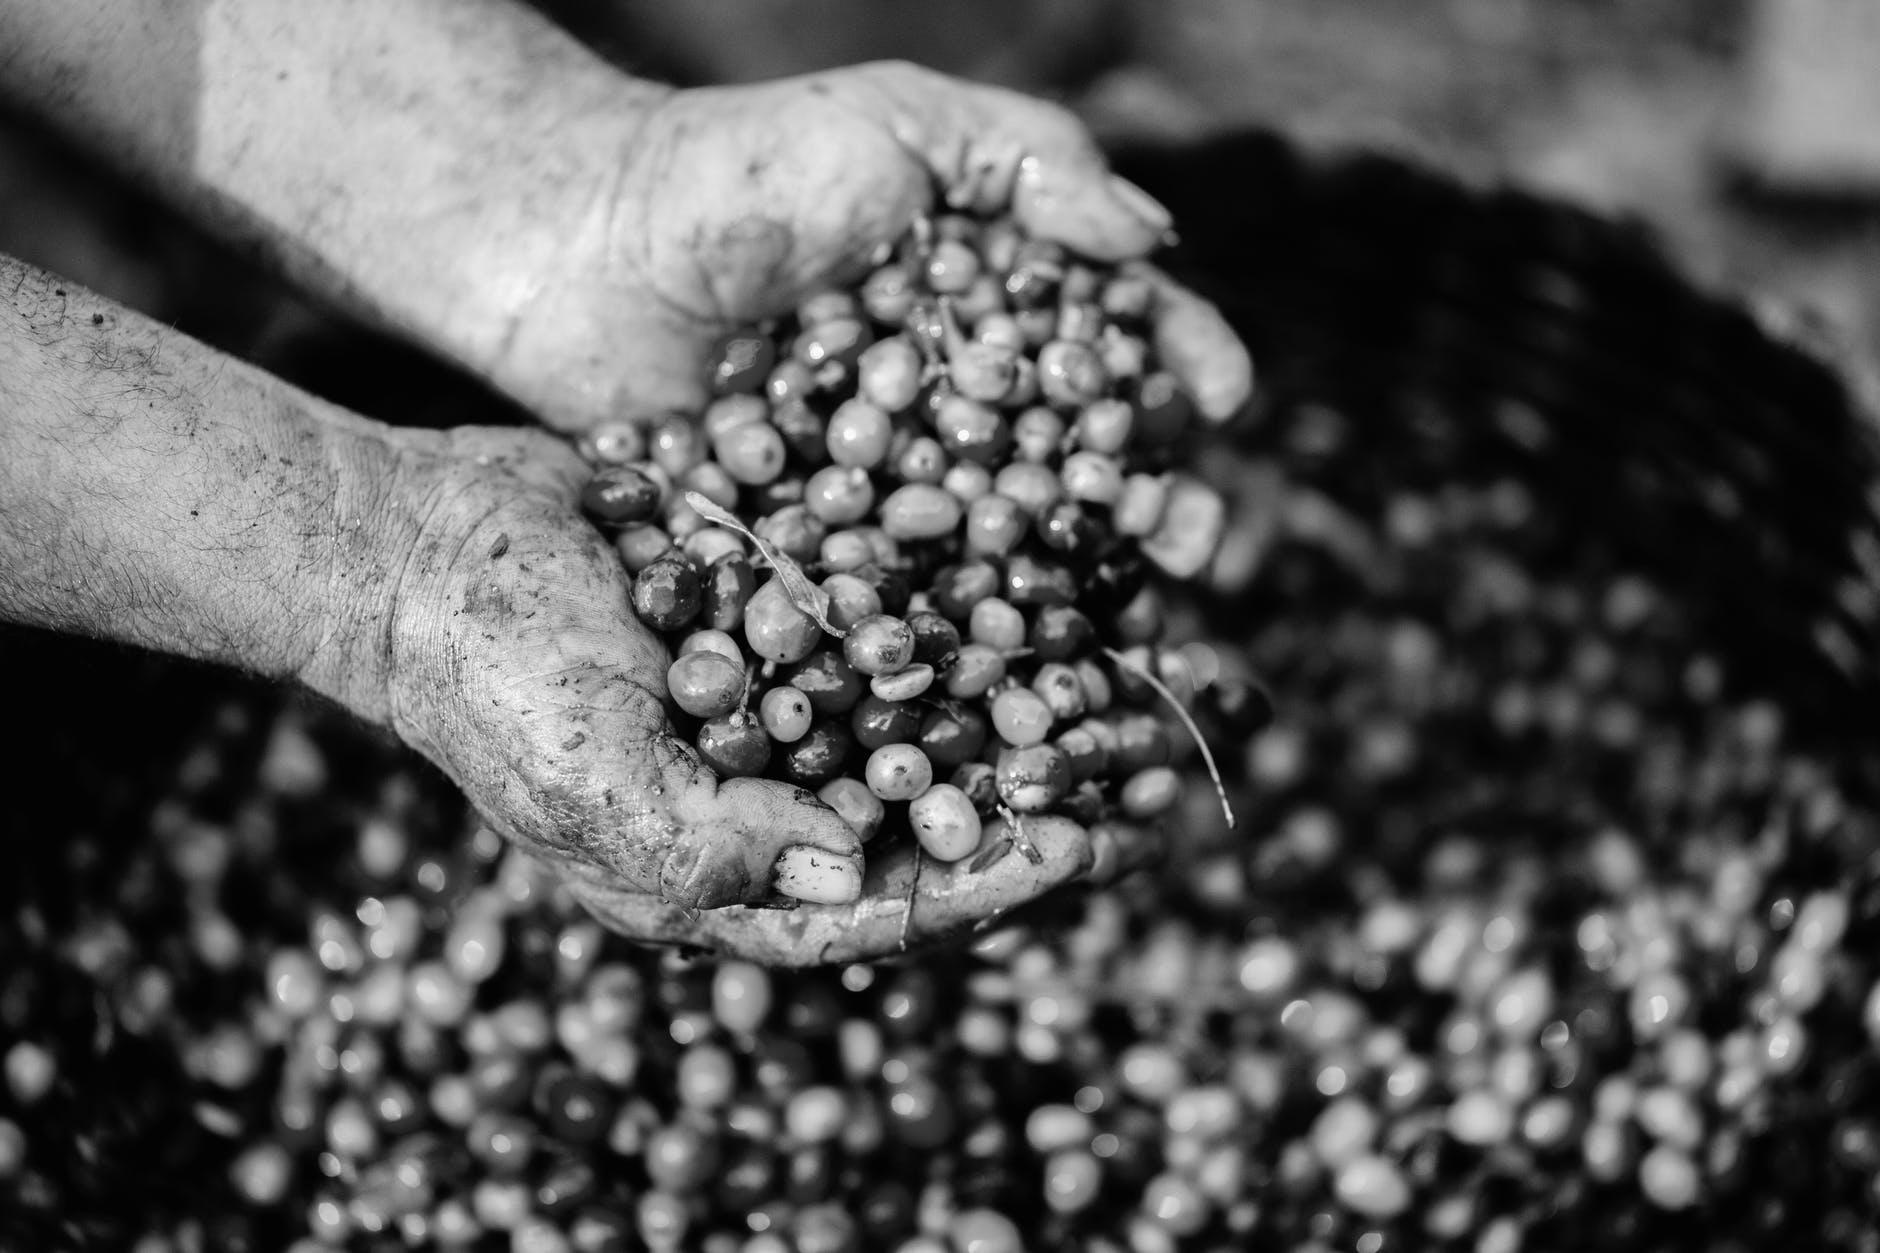 Hands holding coffee cherries